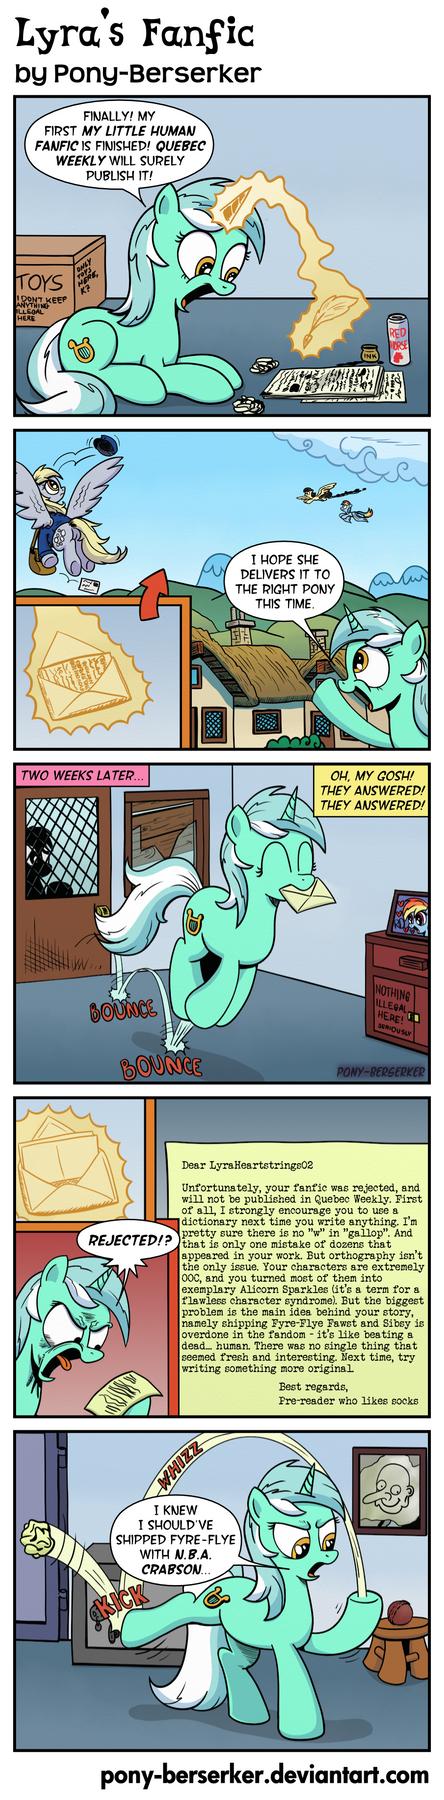 Lyra's Fanfic by Pony-Berserker